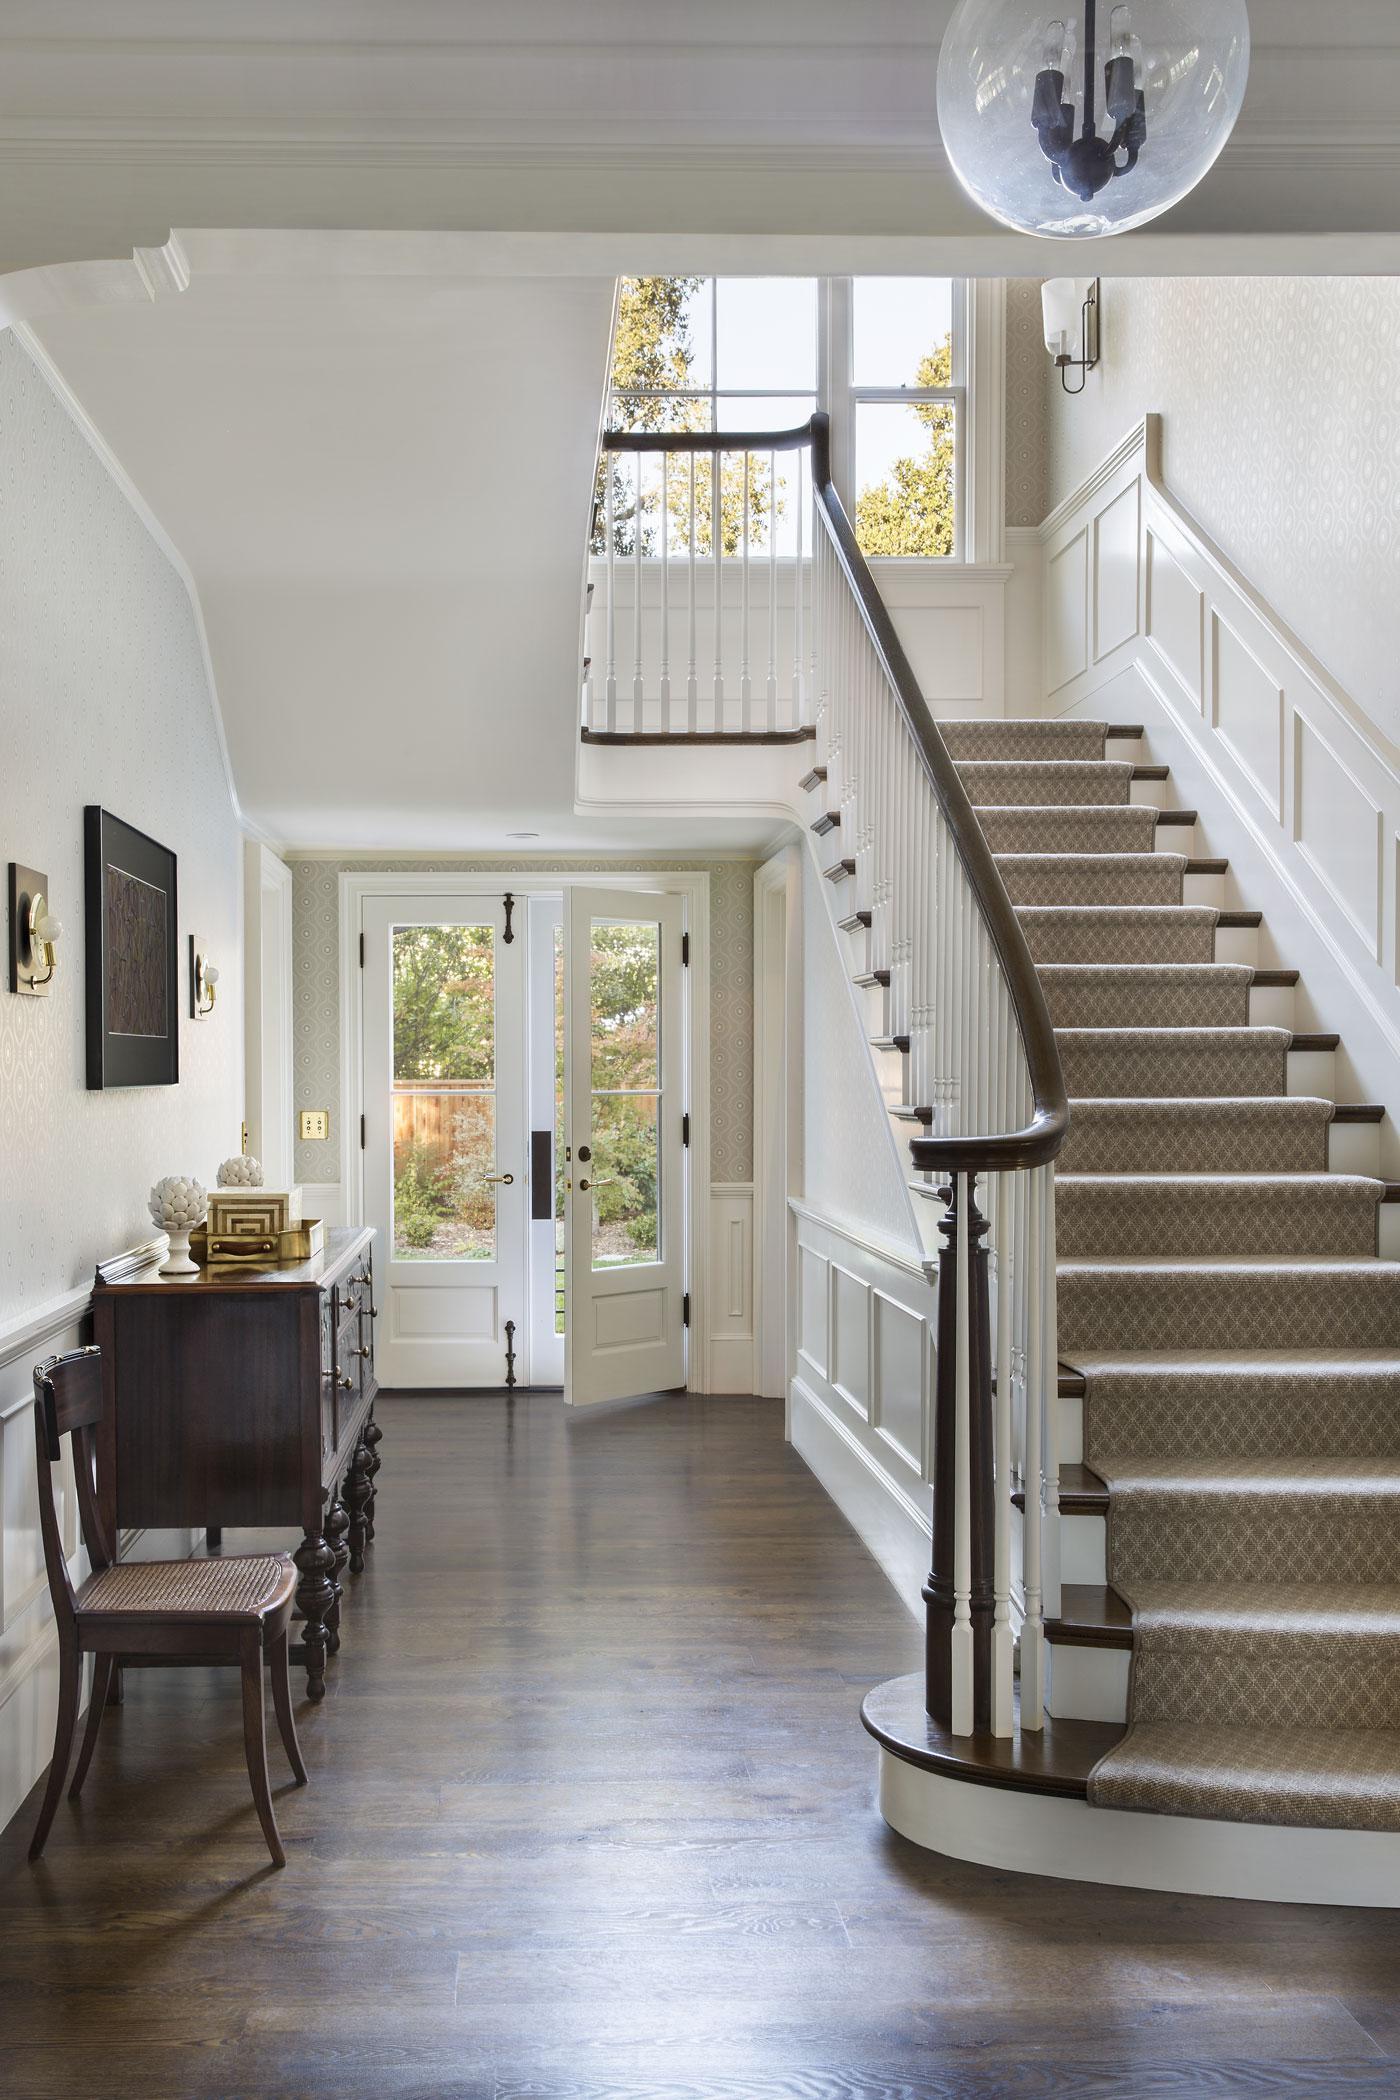 Tim.barber.ltd.portfolio.interiors.hallway.staircase.1507845046.5822403